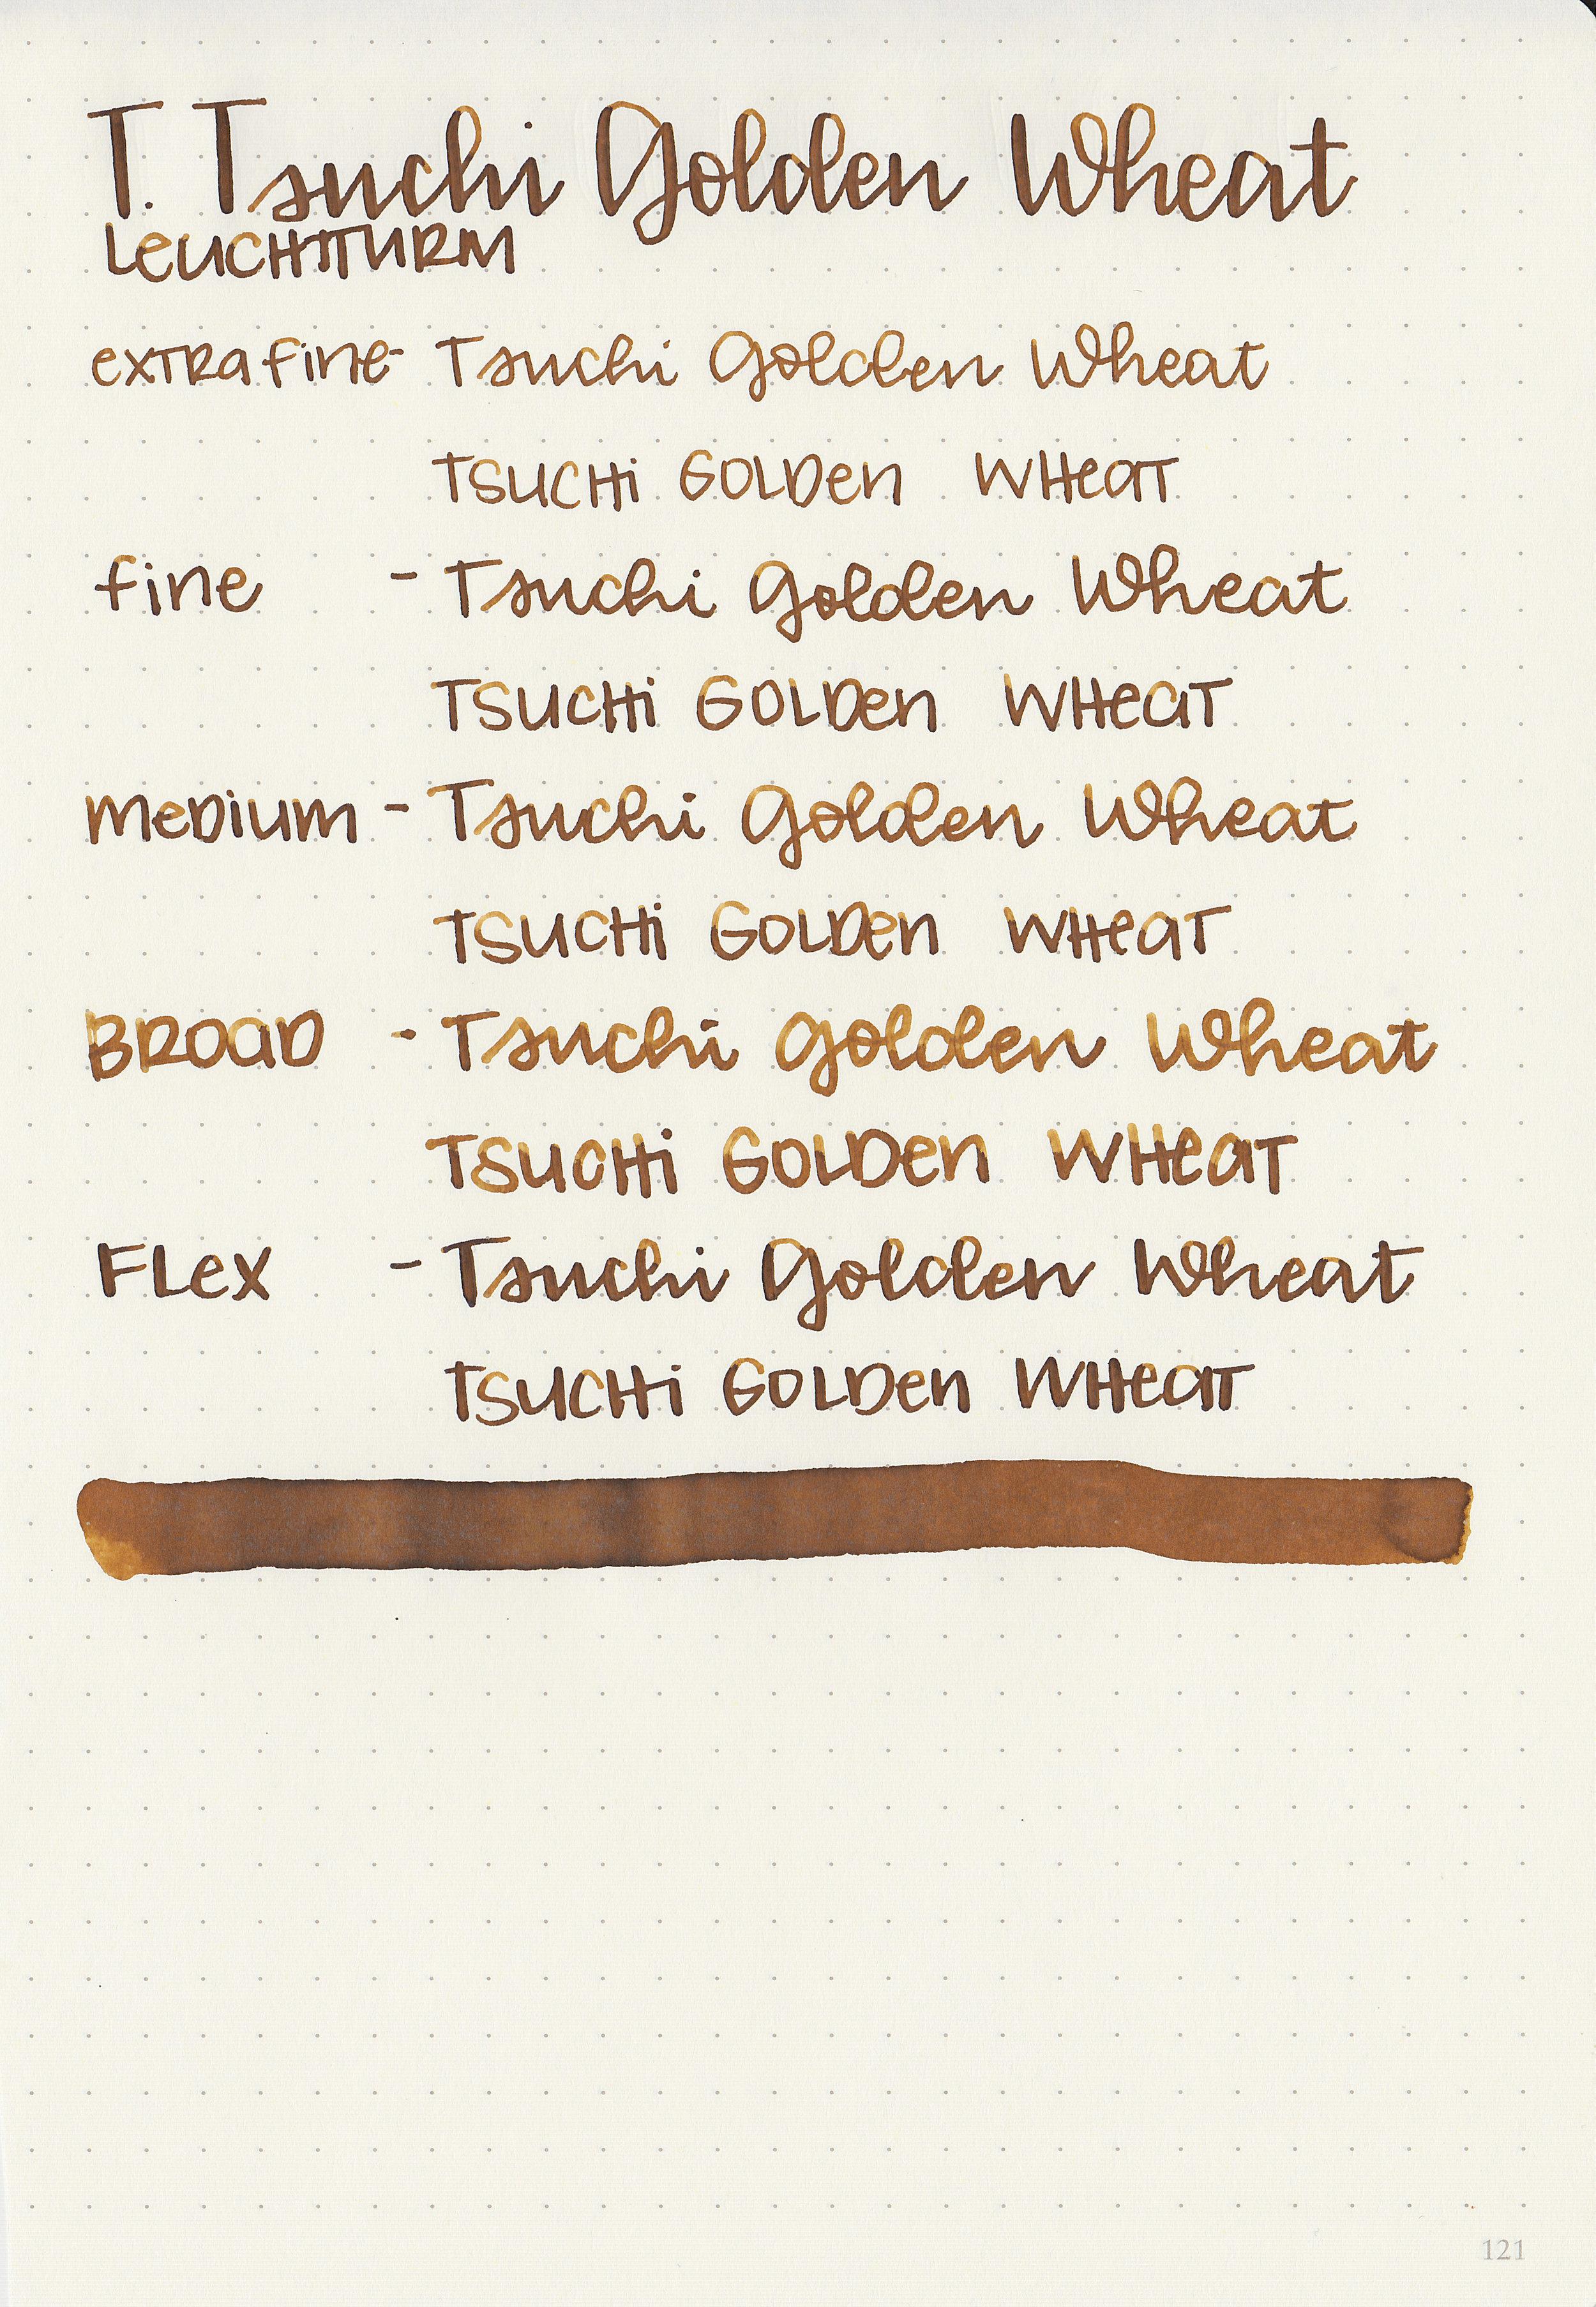 tac-tsuchi-golden-wheat-9.jpg